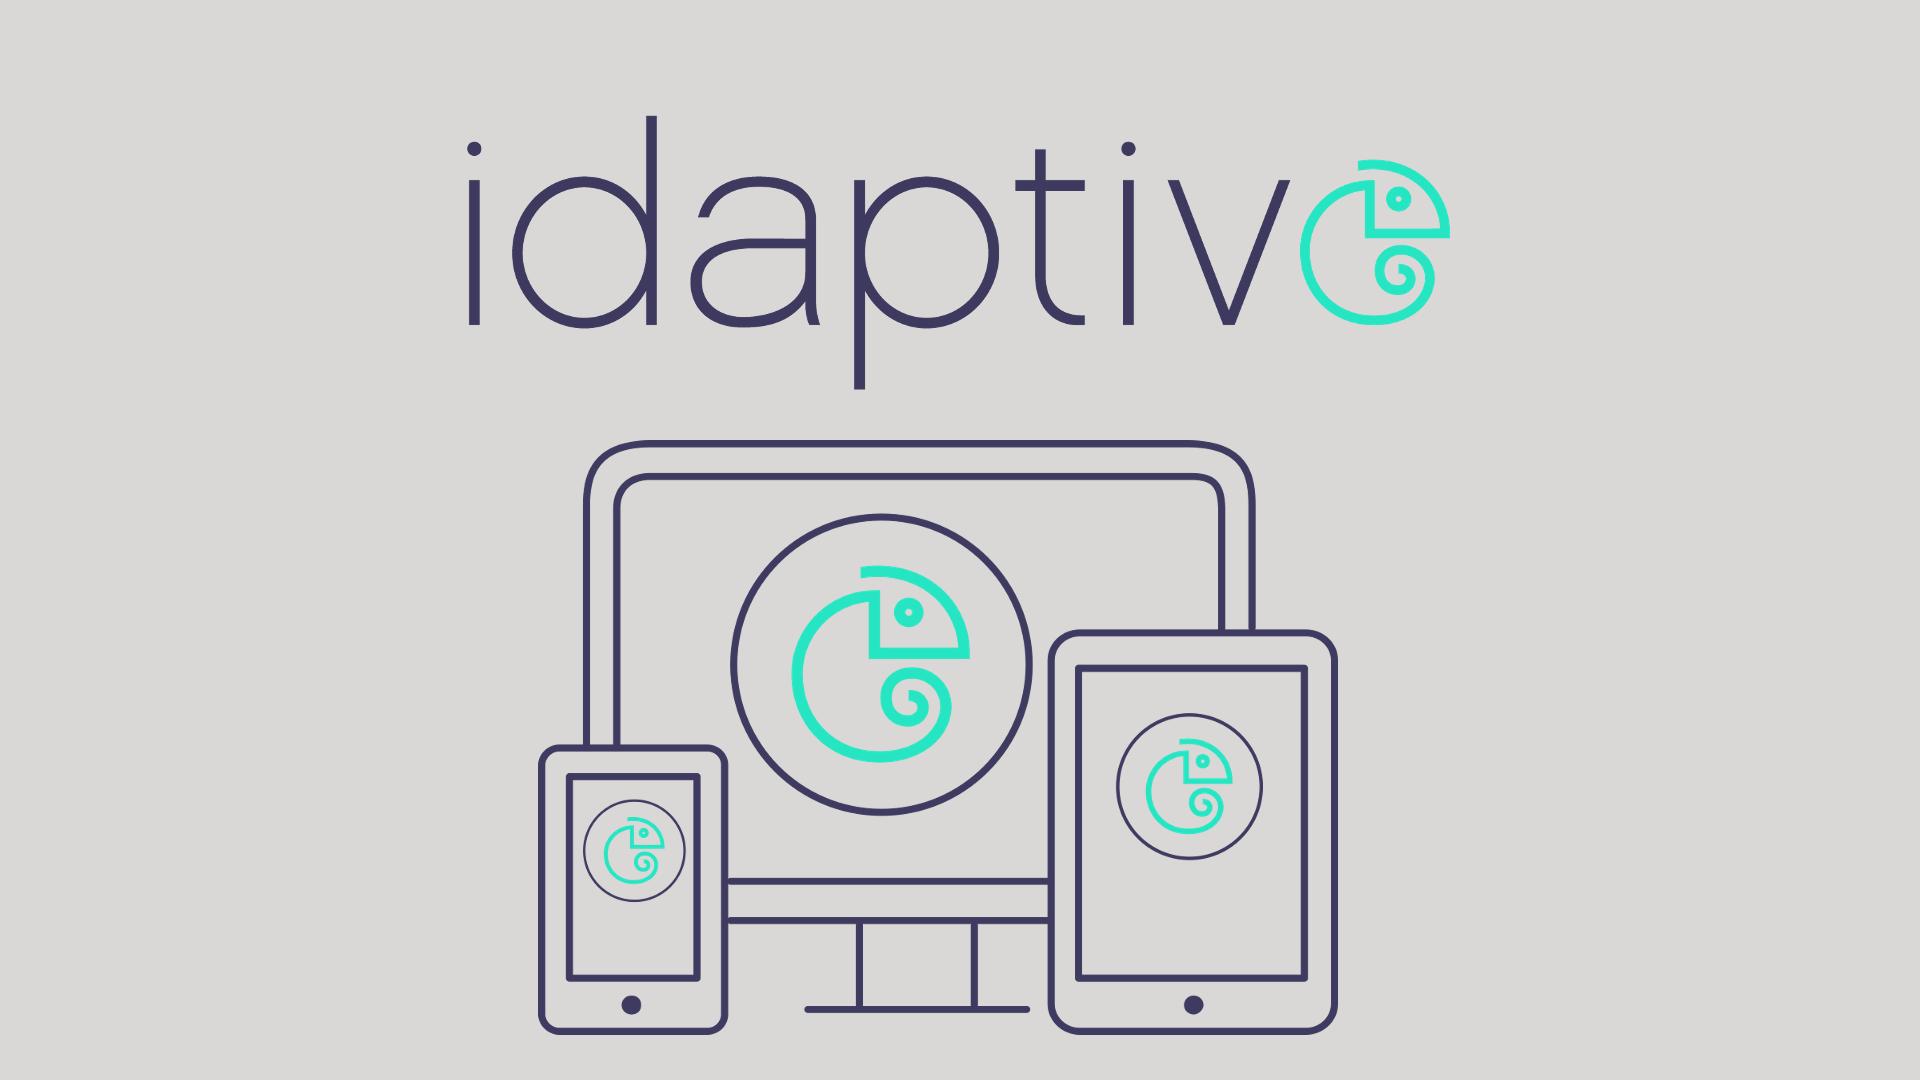 Idaptive Overview